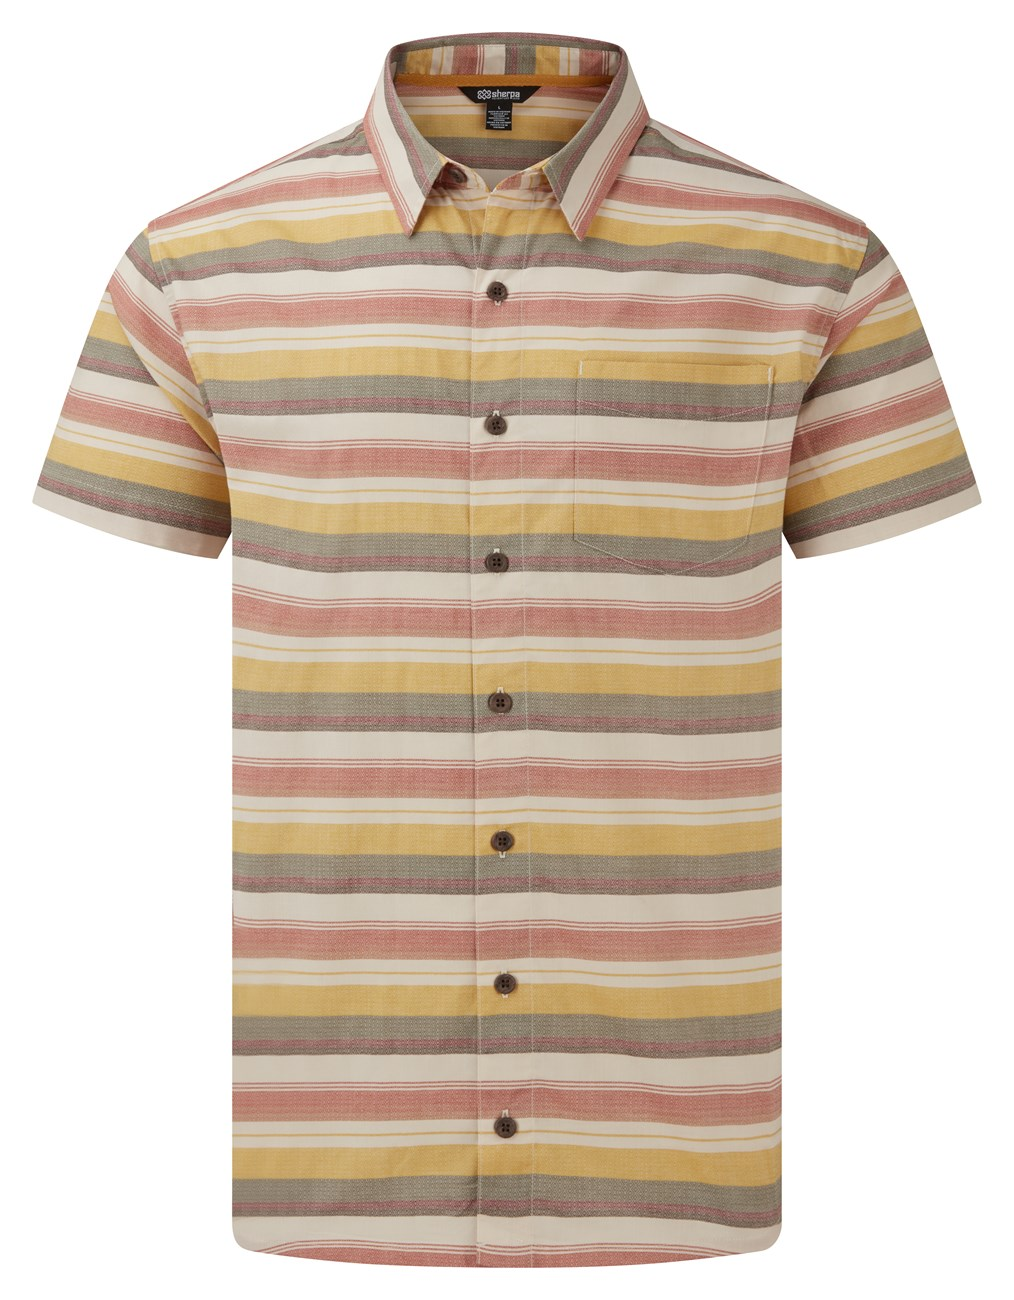 Khelnu Shirt Men